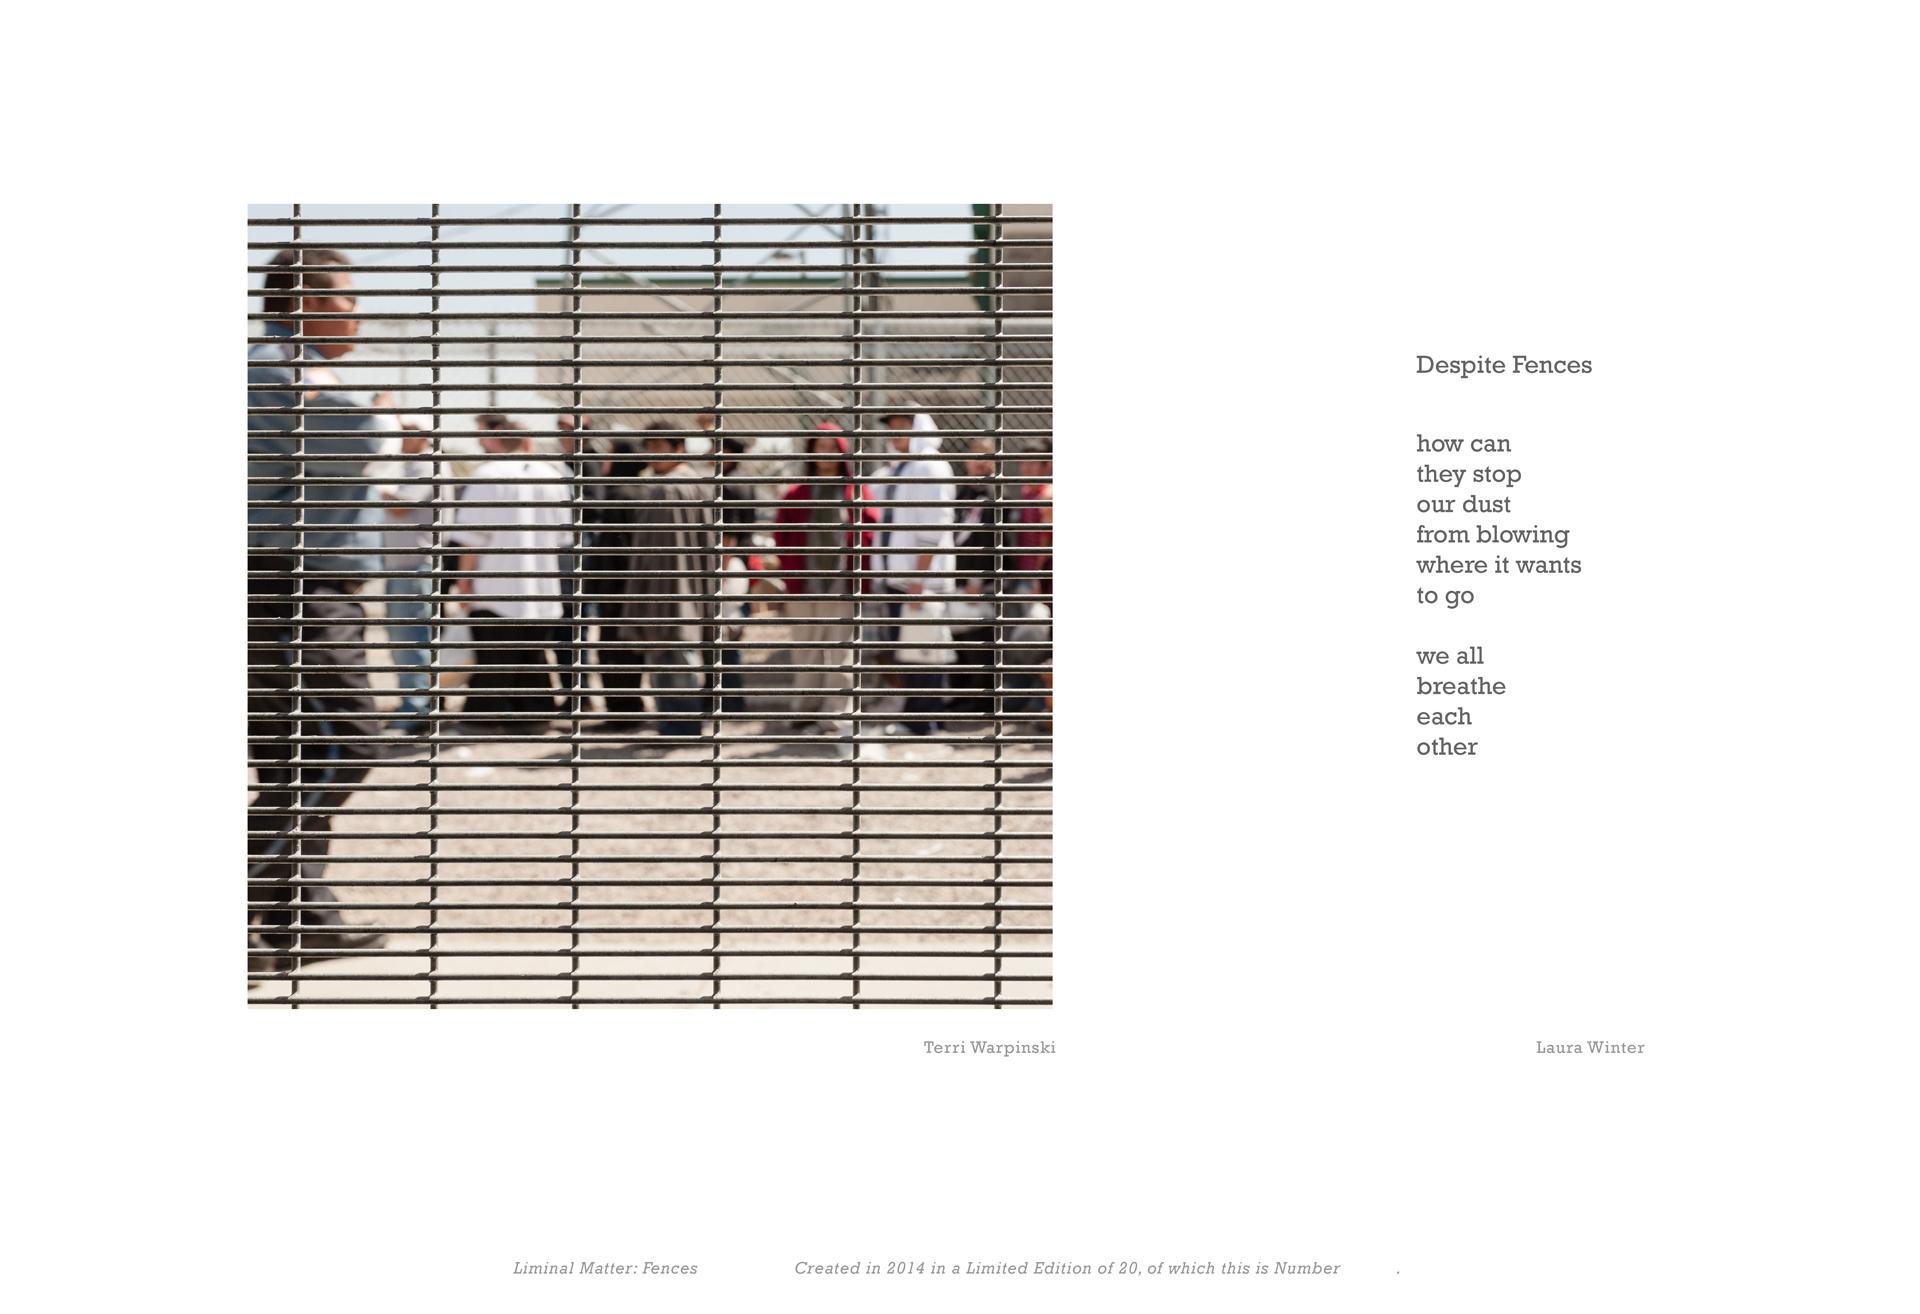 """Despite Fences"" from the portfolio LIMINAL MATTER: FENCES"